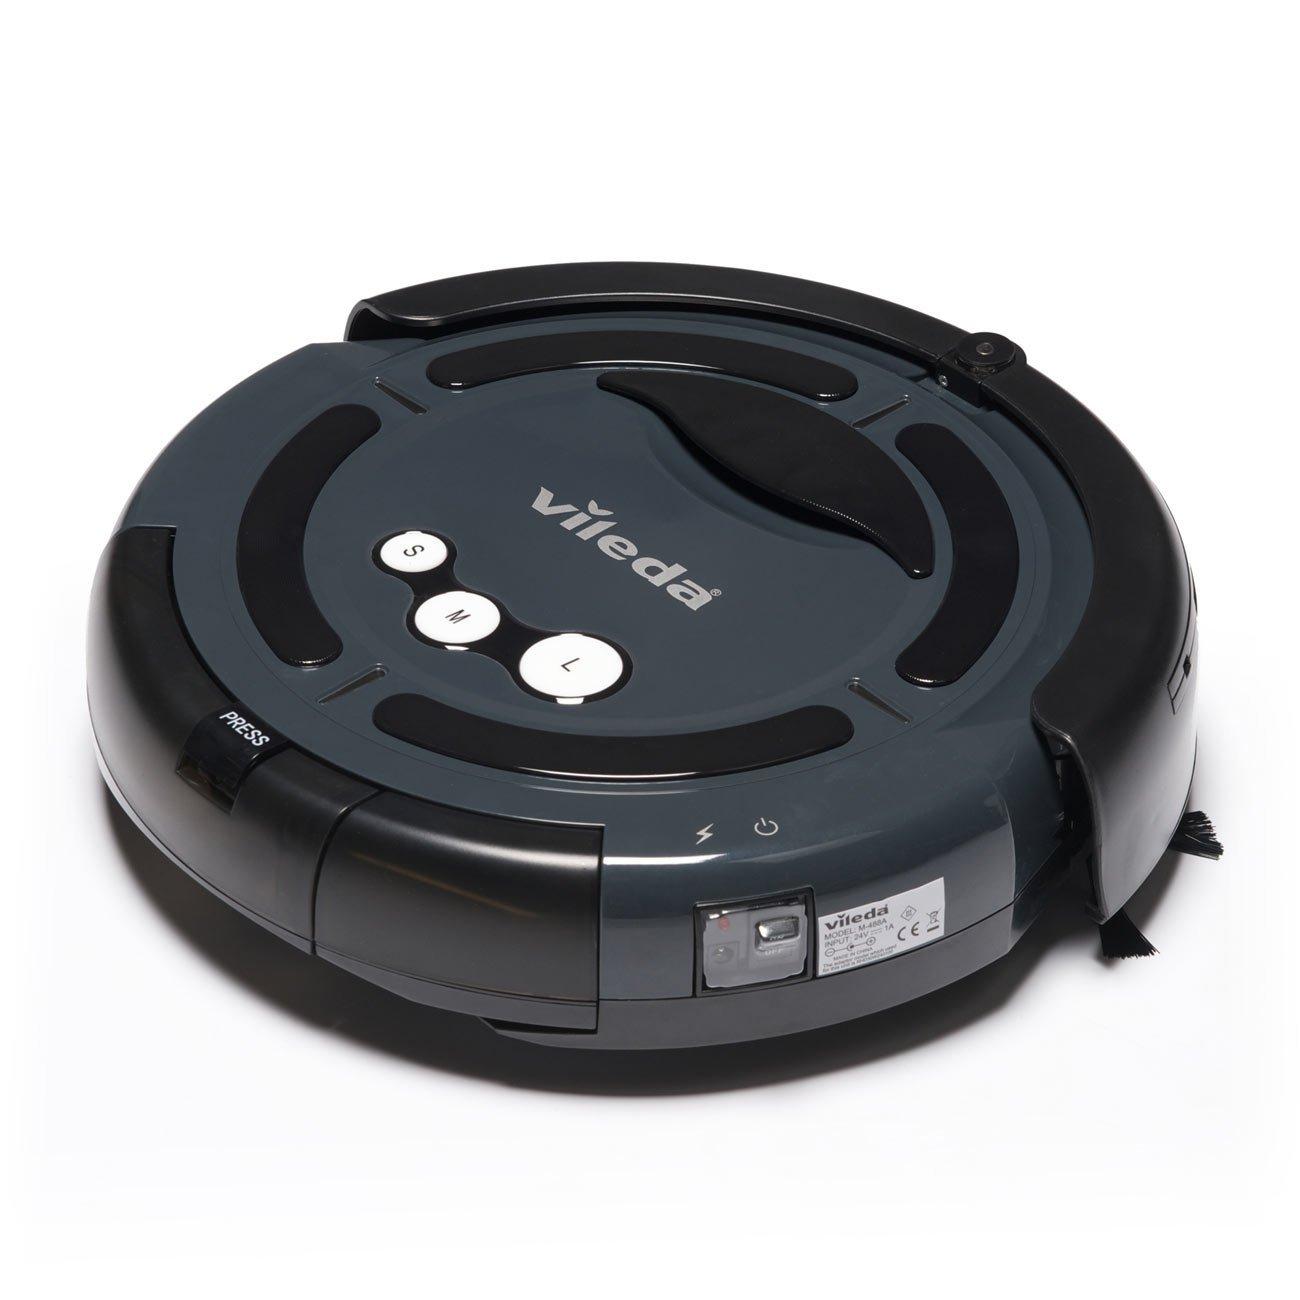 Vileda Robot Vacuum